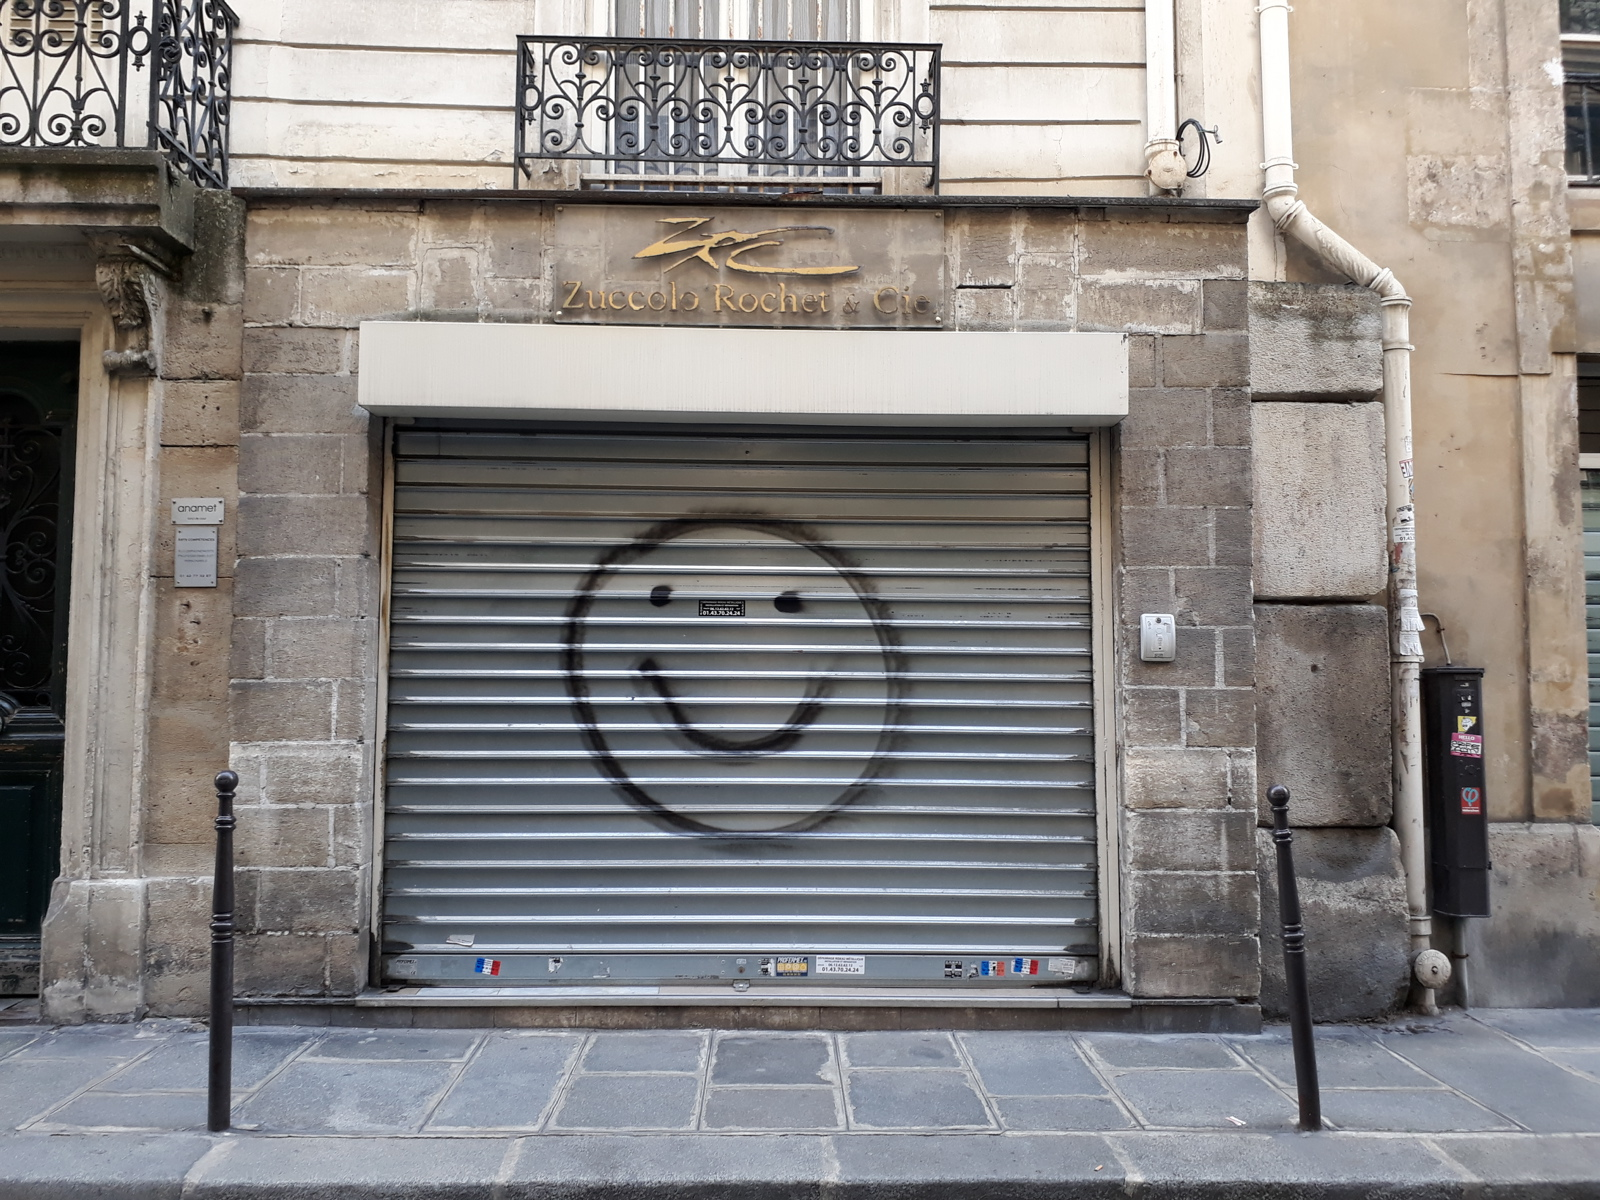 graffiti Smiley